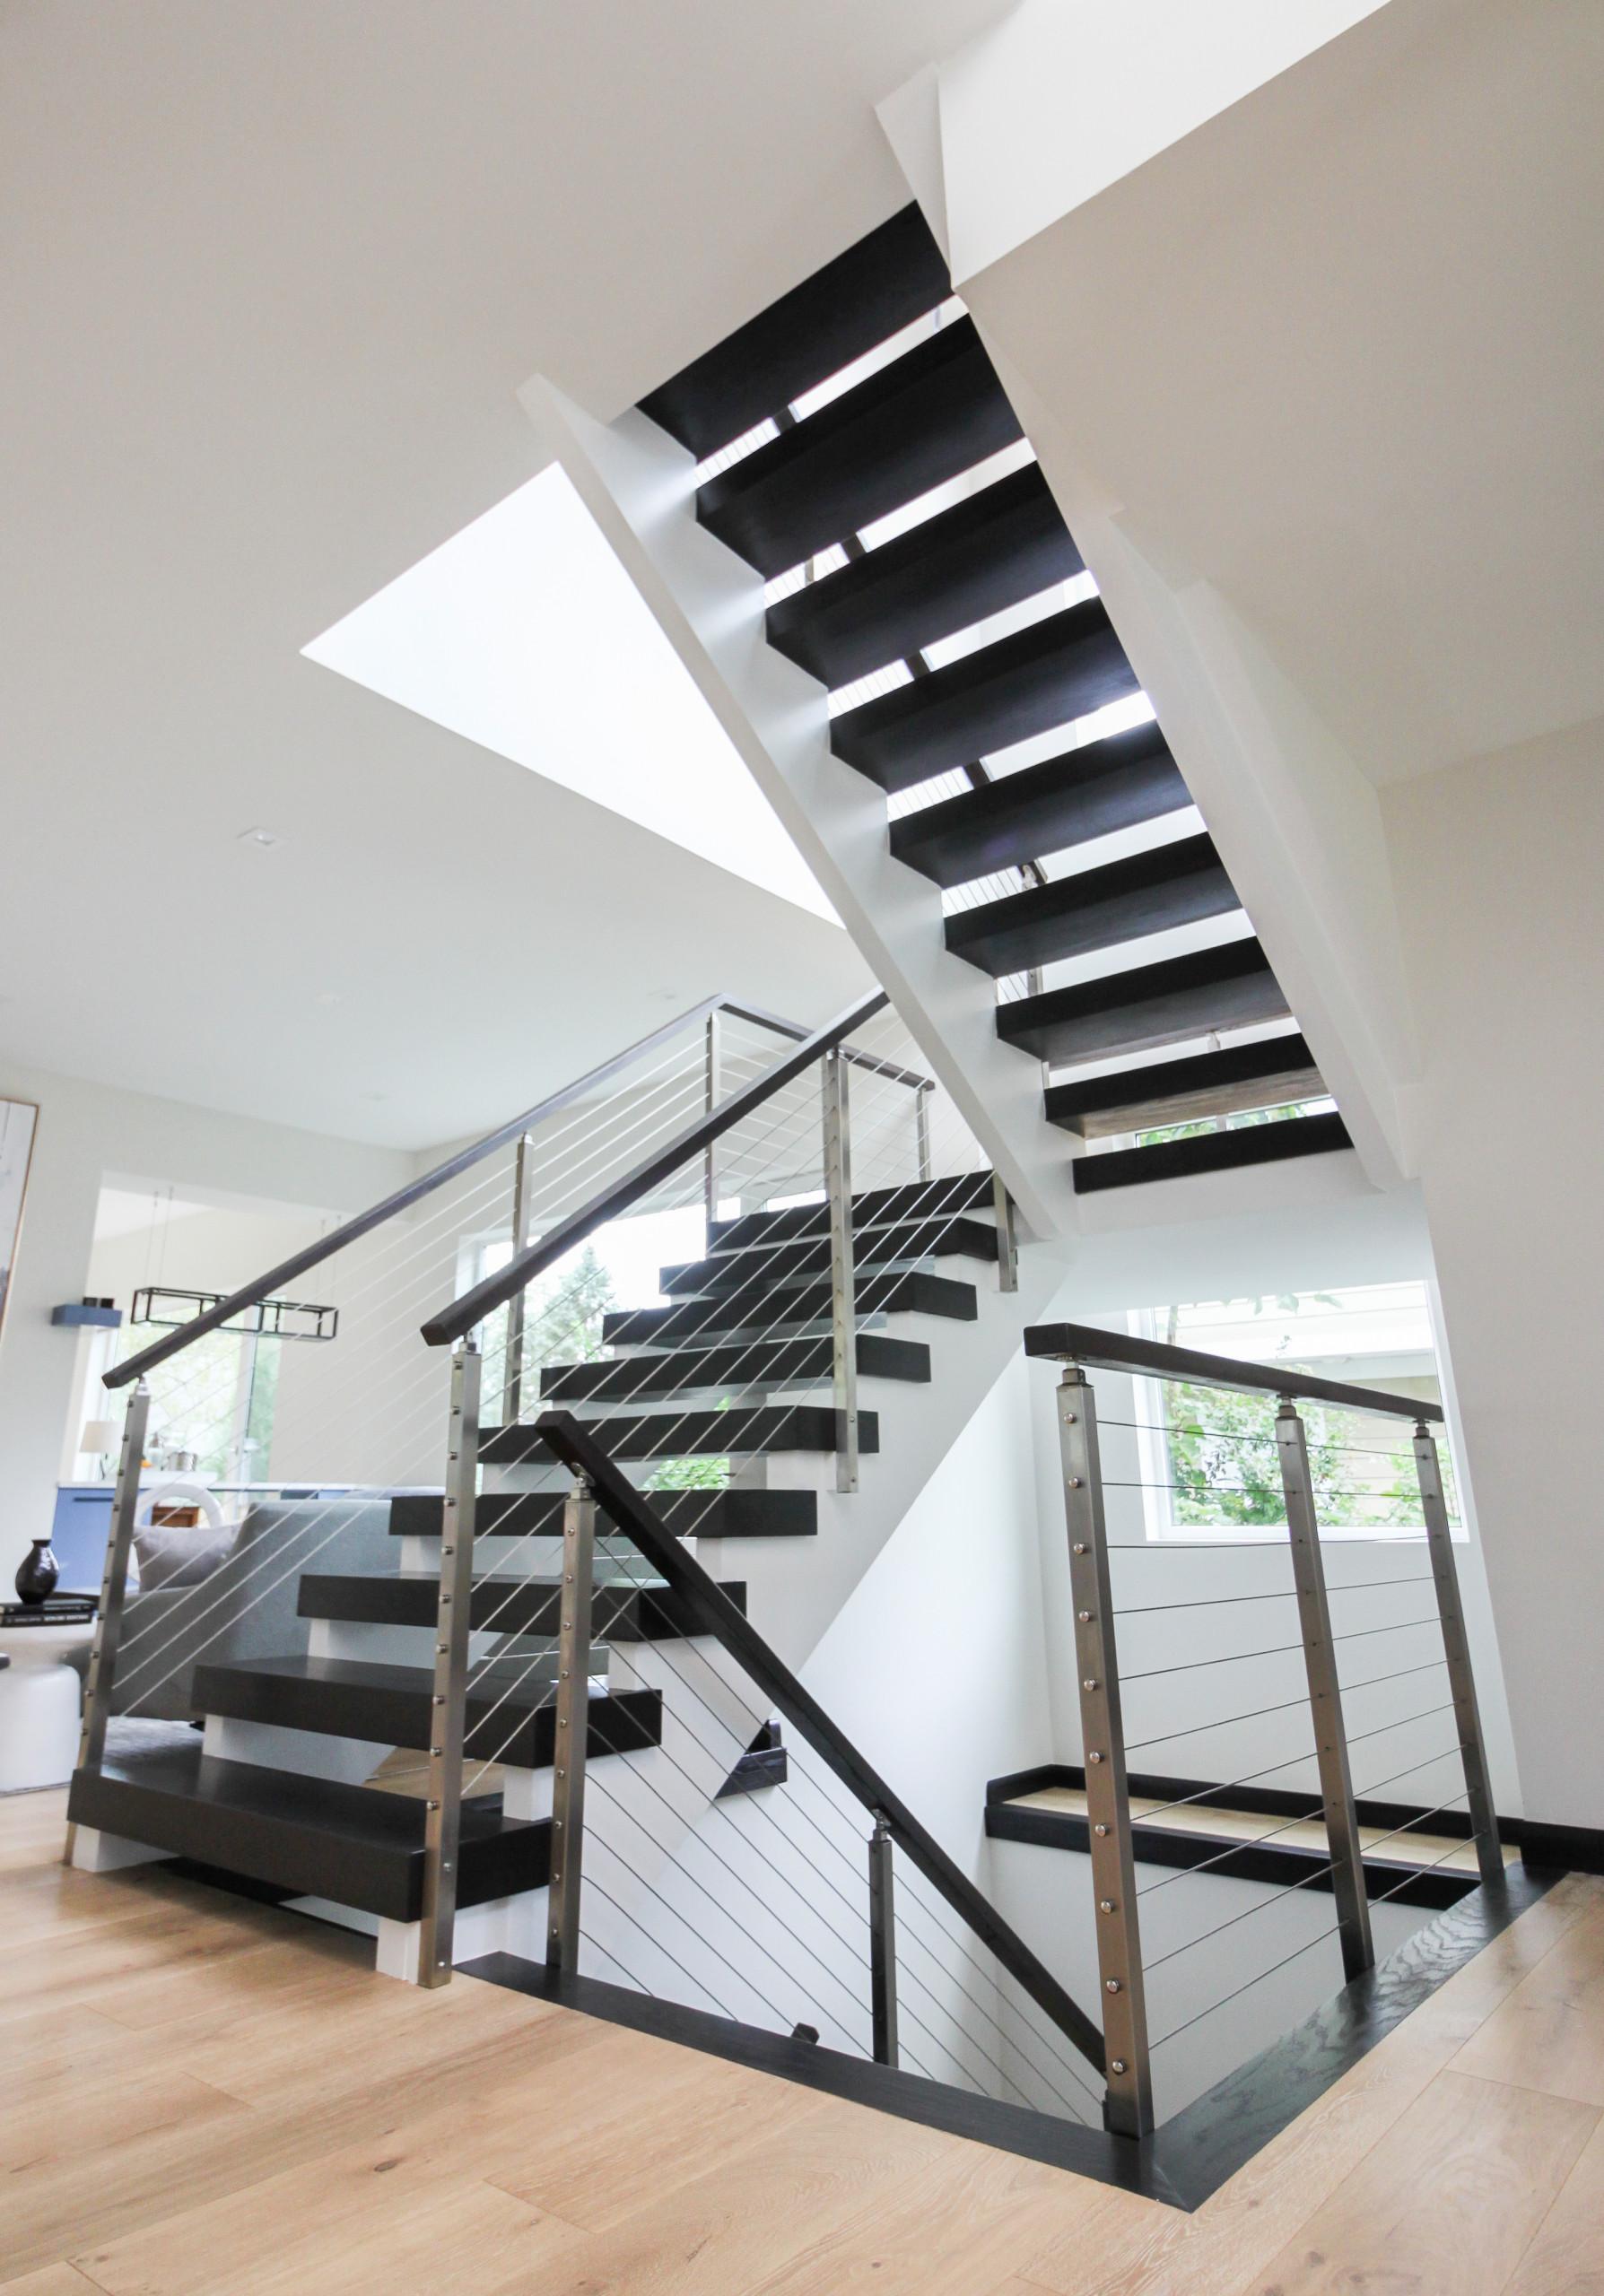 70_Contemporary Stairs With No Risers & Horizontal Railing, Vienna VA 22180